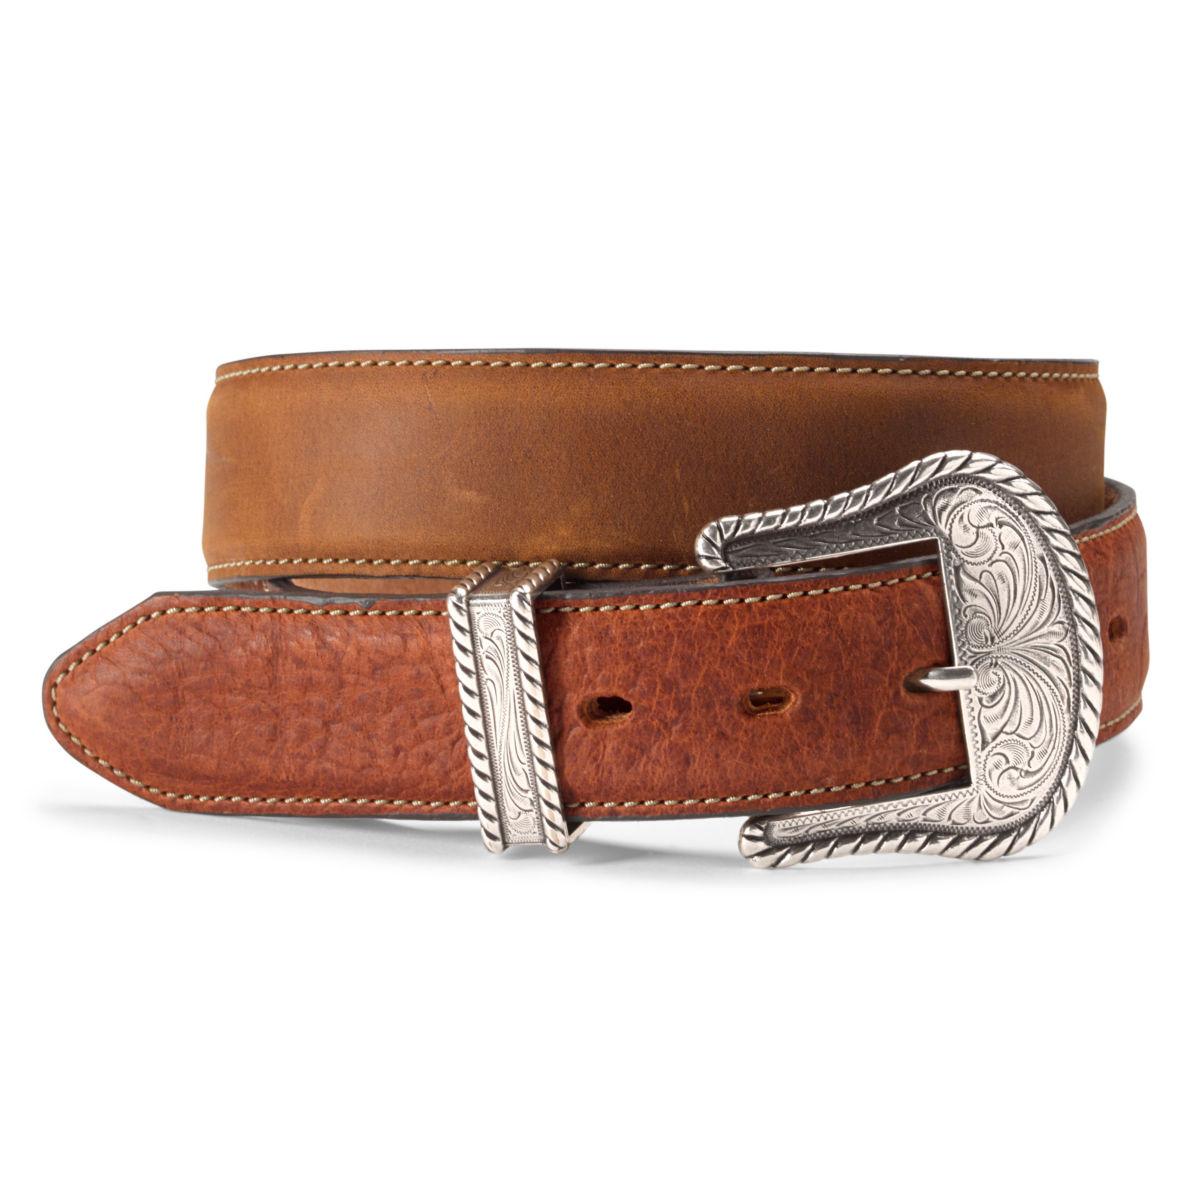 Cheyenne Western Belt - TANimage number 0